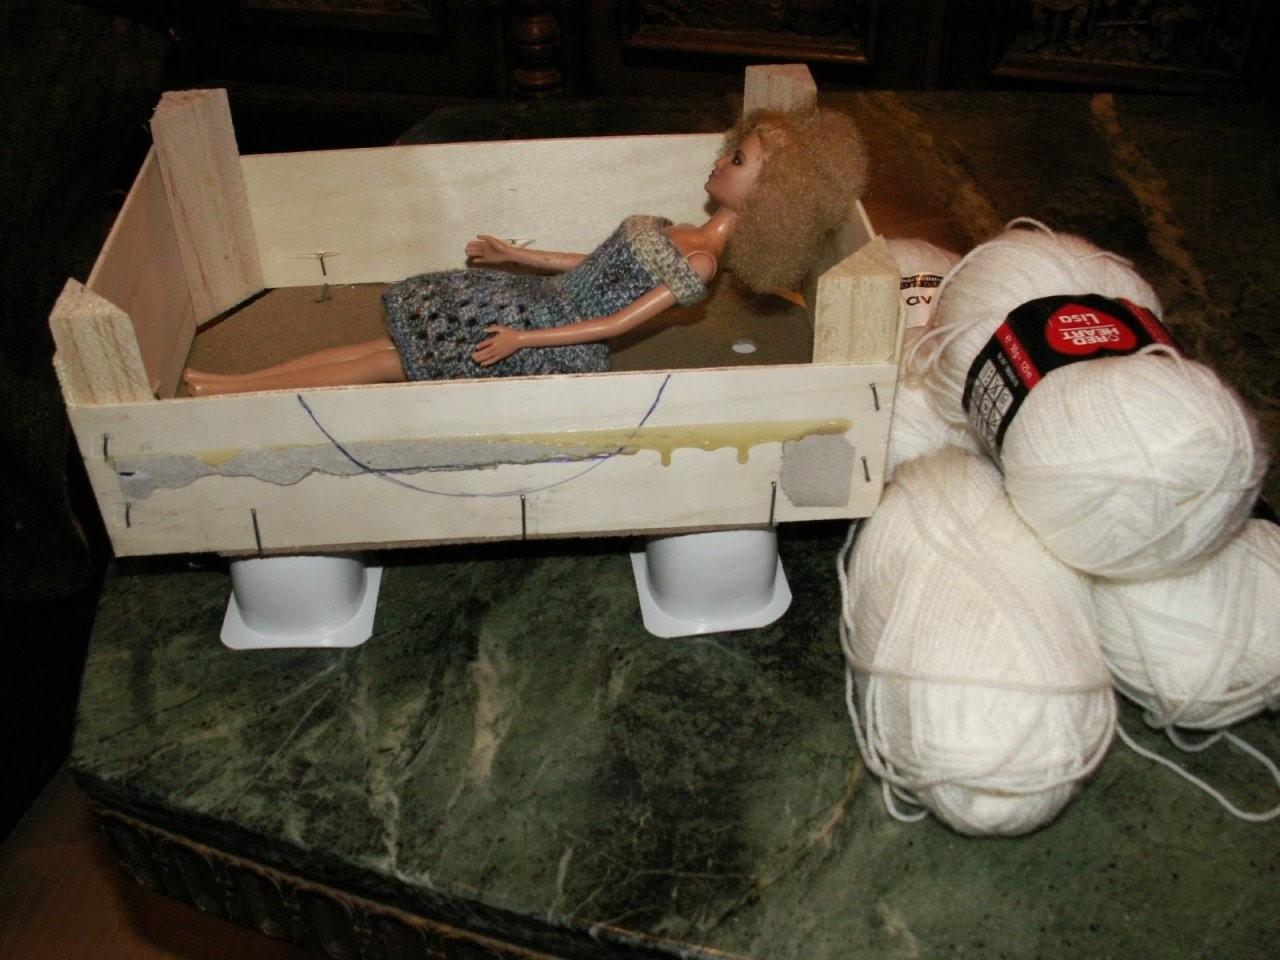 Barbie Bett Basteln Dansenfeesten Barbie Bett Selber Bauen  Bett Ideen von Barbie Bett Selber Bauen Photo